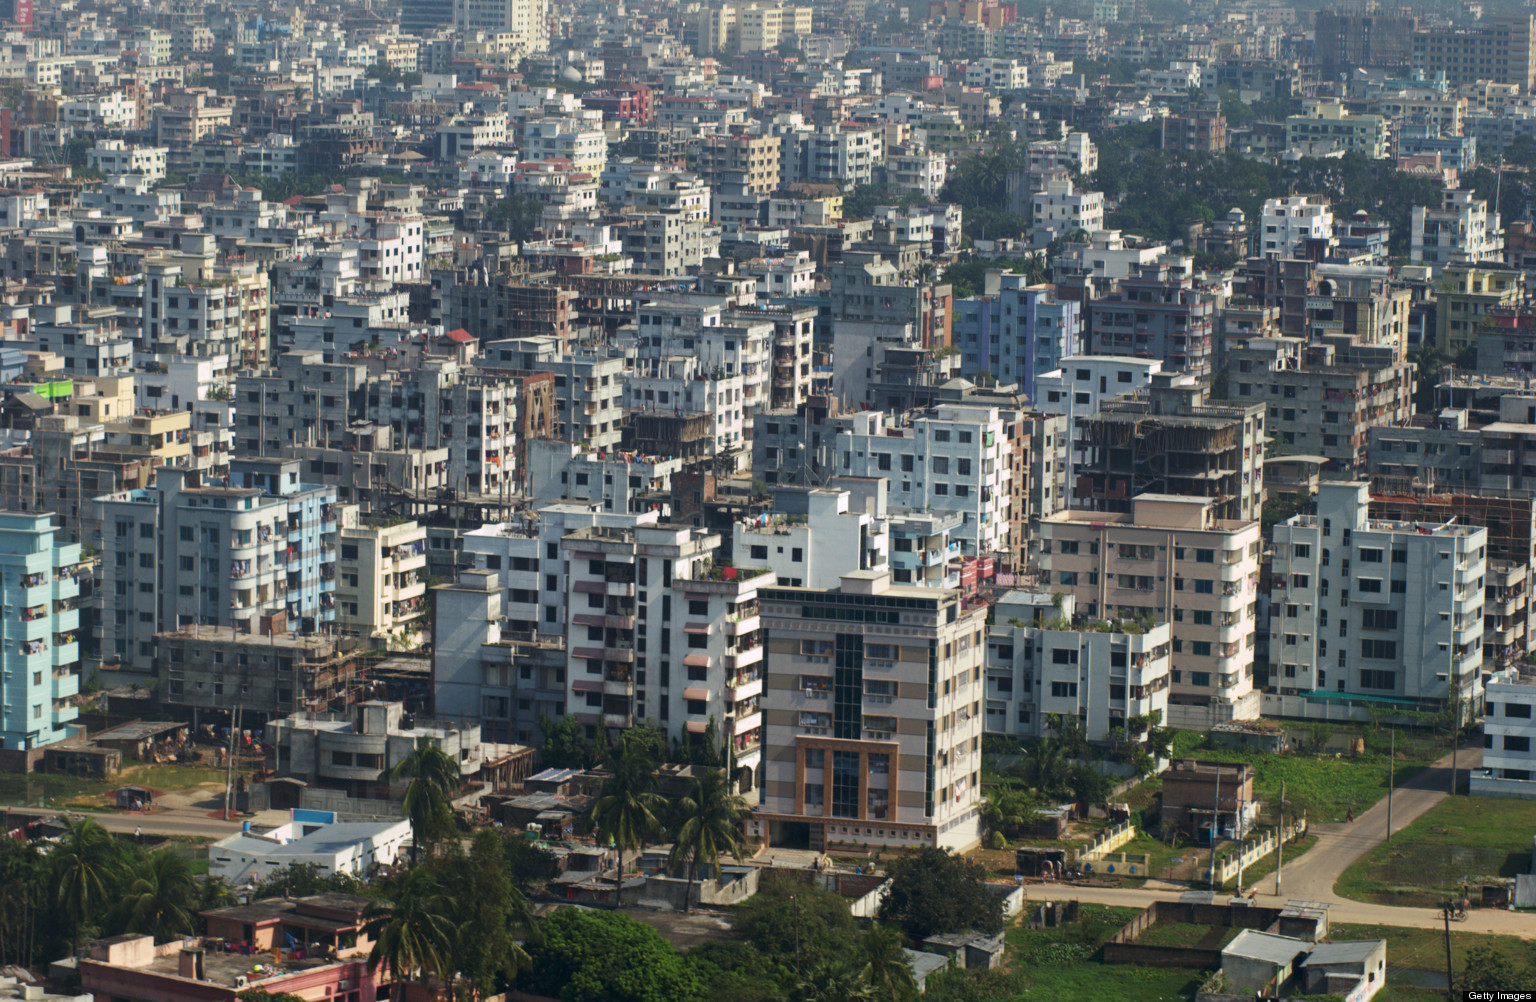 Dhaka Bangladesh Pictures And Videos And News Citiestips Com